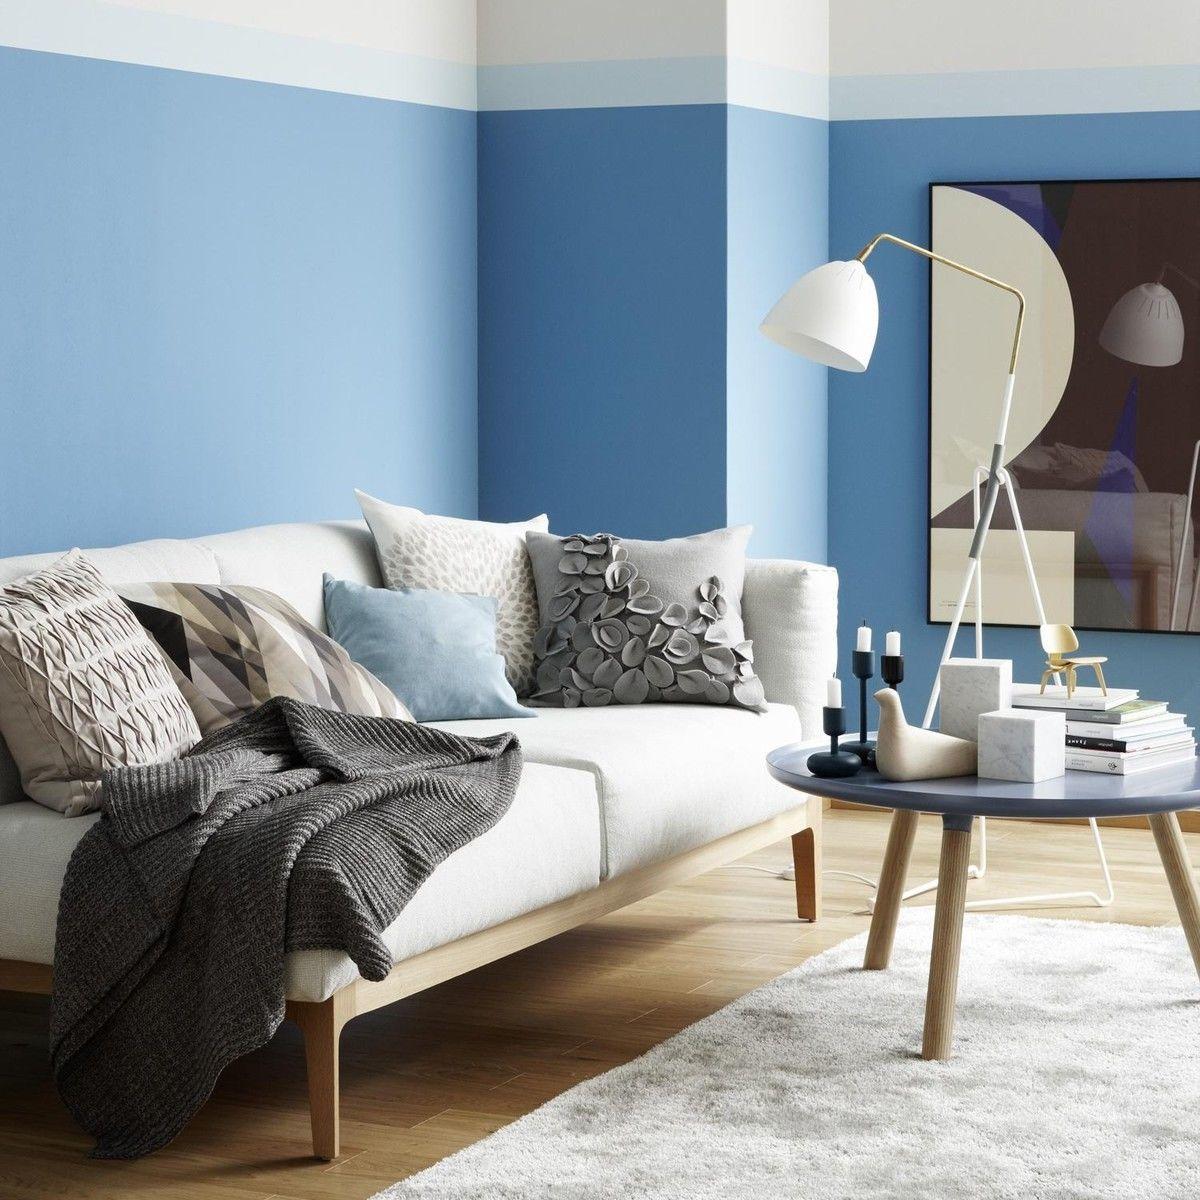 l 39 oiseau bouroullec figurine vitra. Black Bedroom Furniture Sets. Home Design Ideas